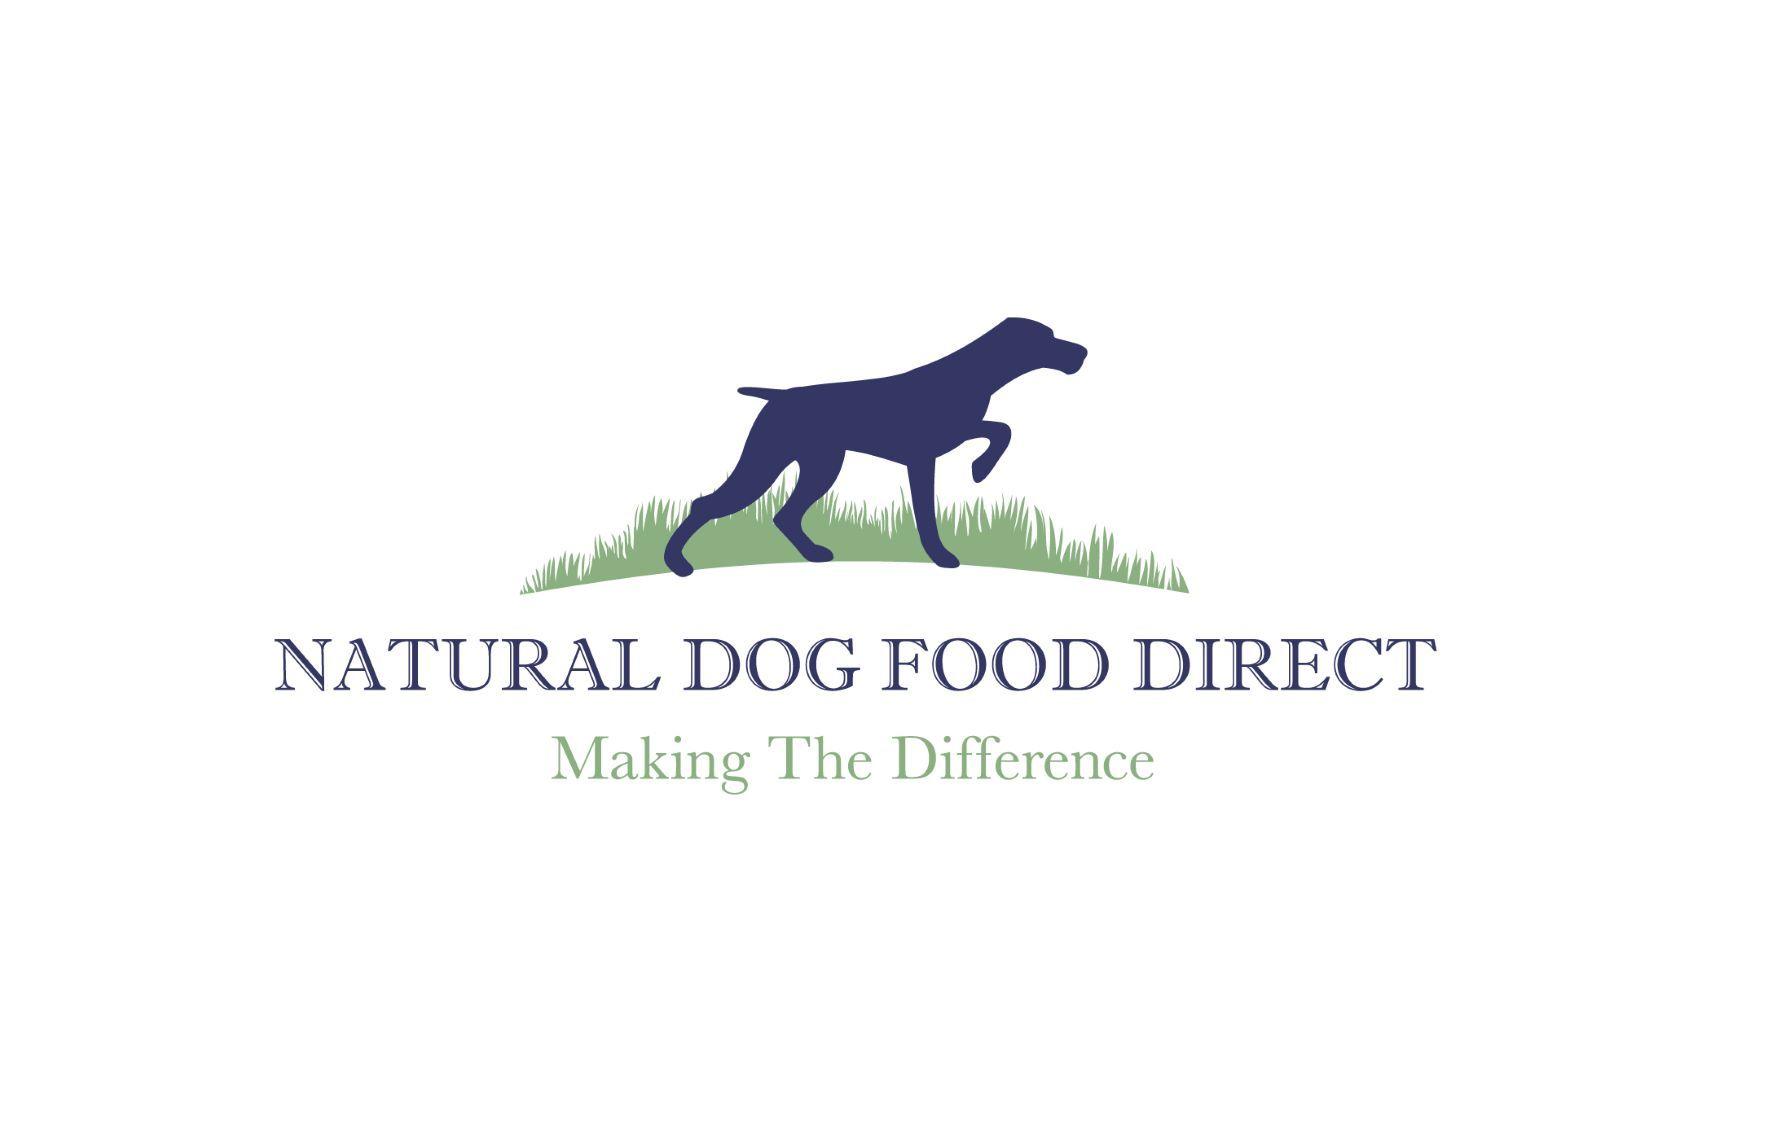 Natural Dog Food Direct